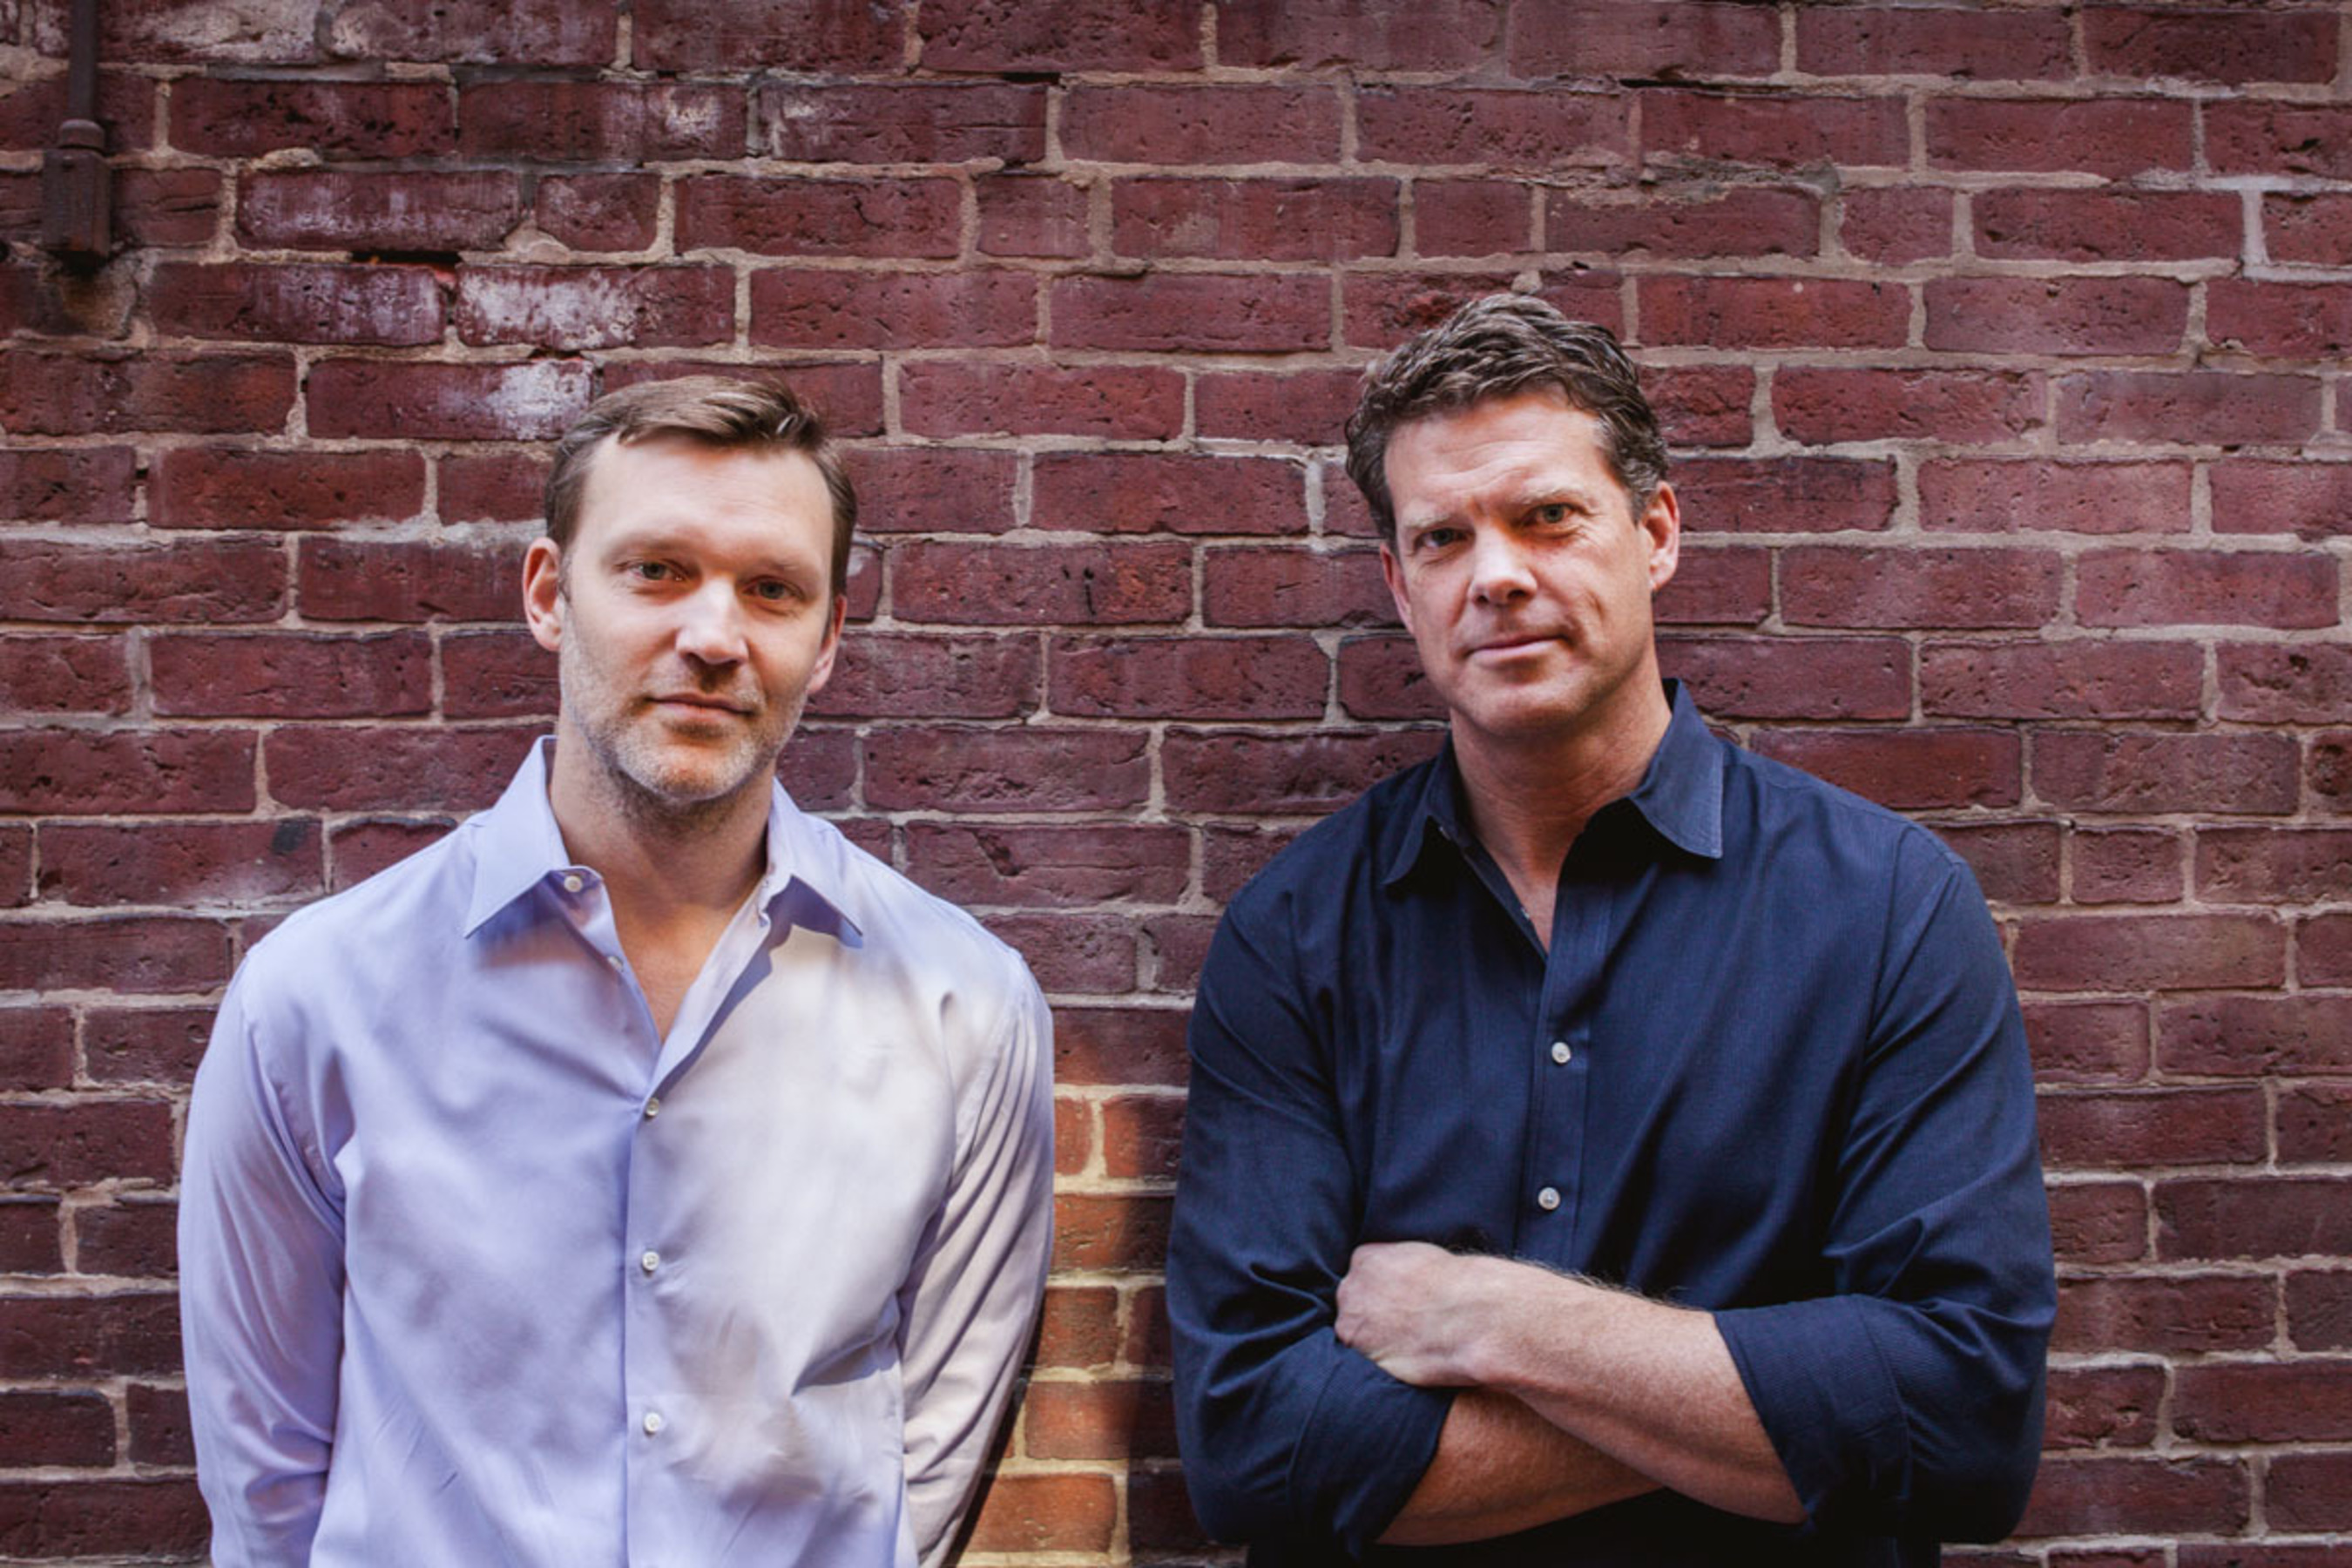 Elliott Seaborn and Paul Nelson, Managing Directors, Arnold Worldwide, Boston. (PRNewsFoto/Arnold Worldwide) (PRNewsFoto/ARNOLD WORLDWIDE)